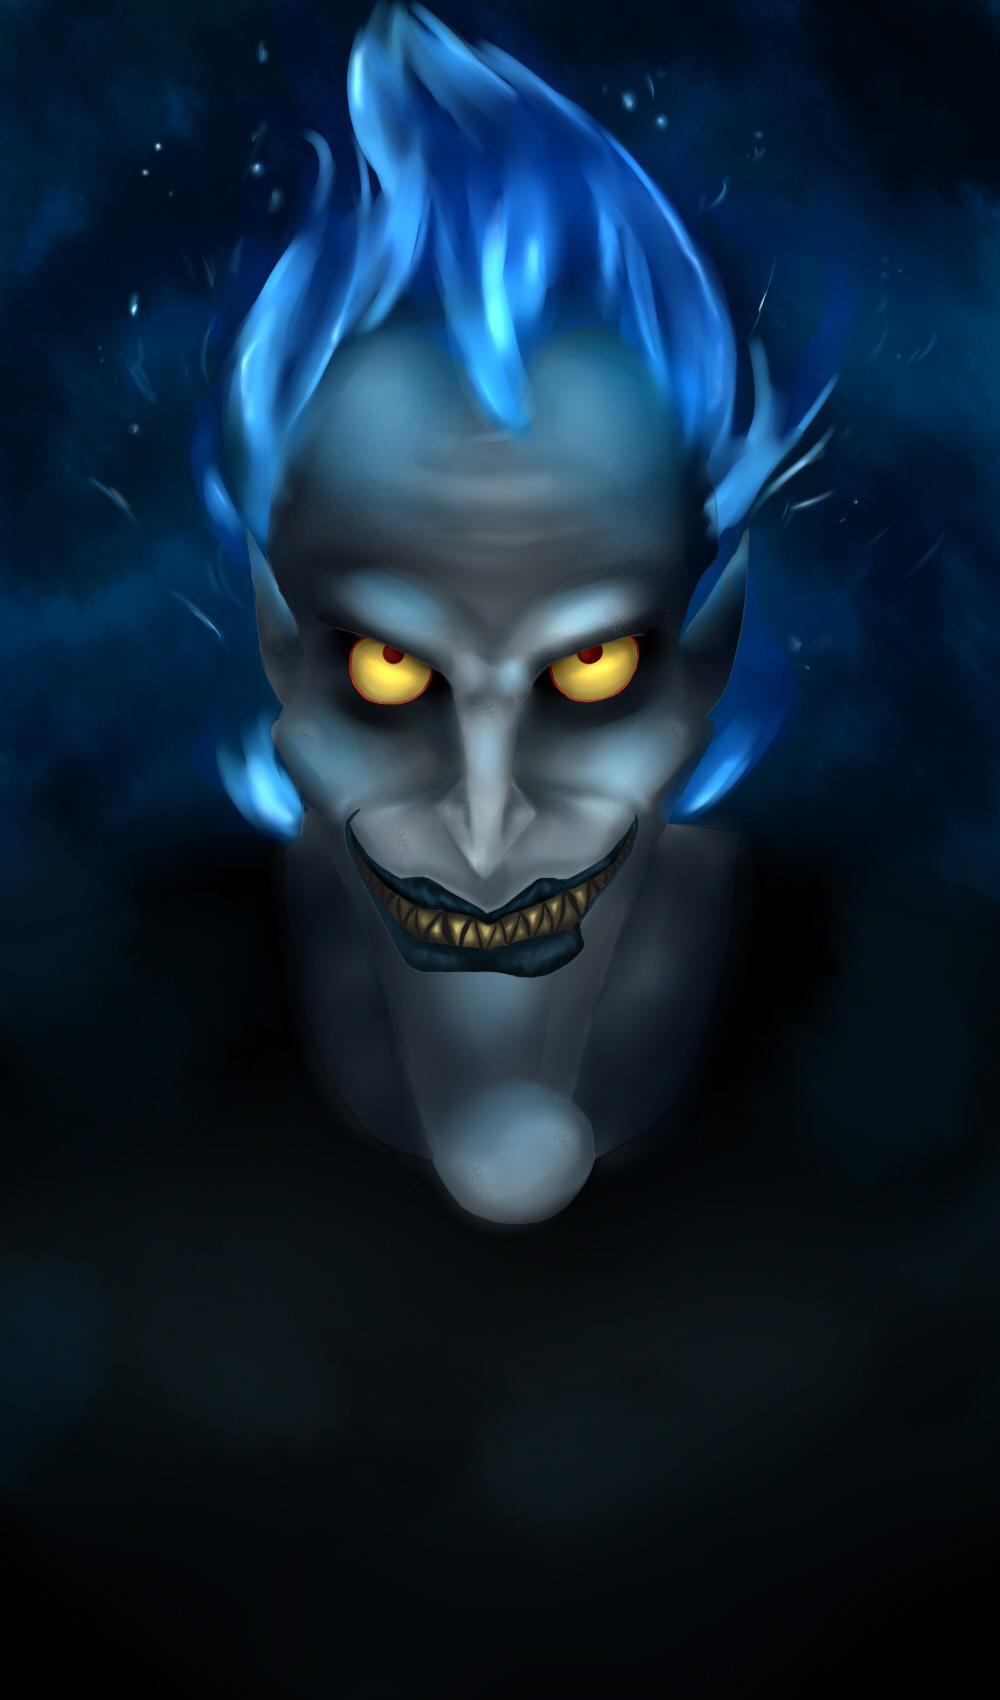 Disney Villains Hades by RavingRobot 1000x1700